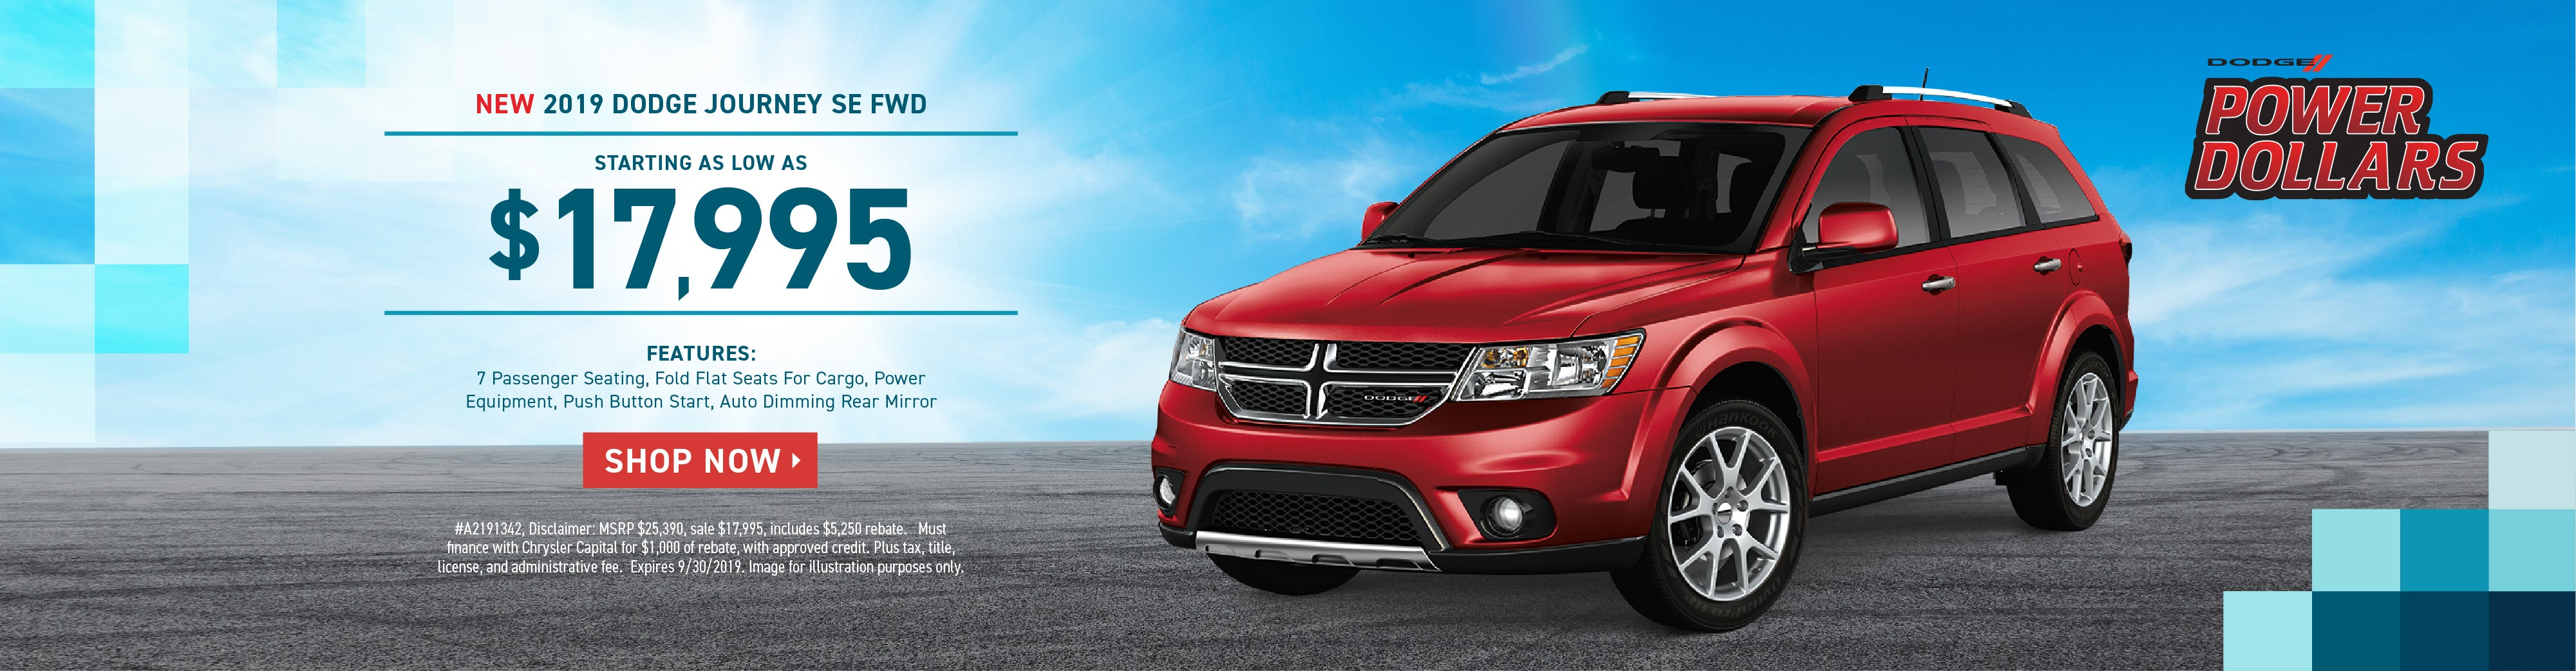 Car Dealer Wichita, KS | New and Used Cars | Davis-Moore